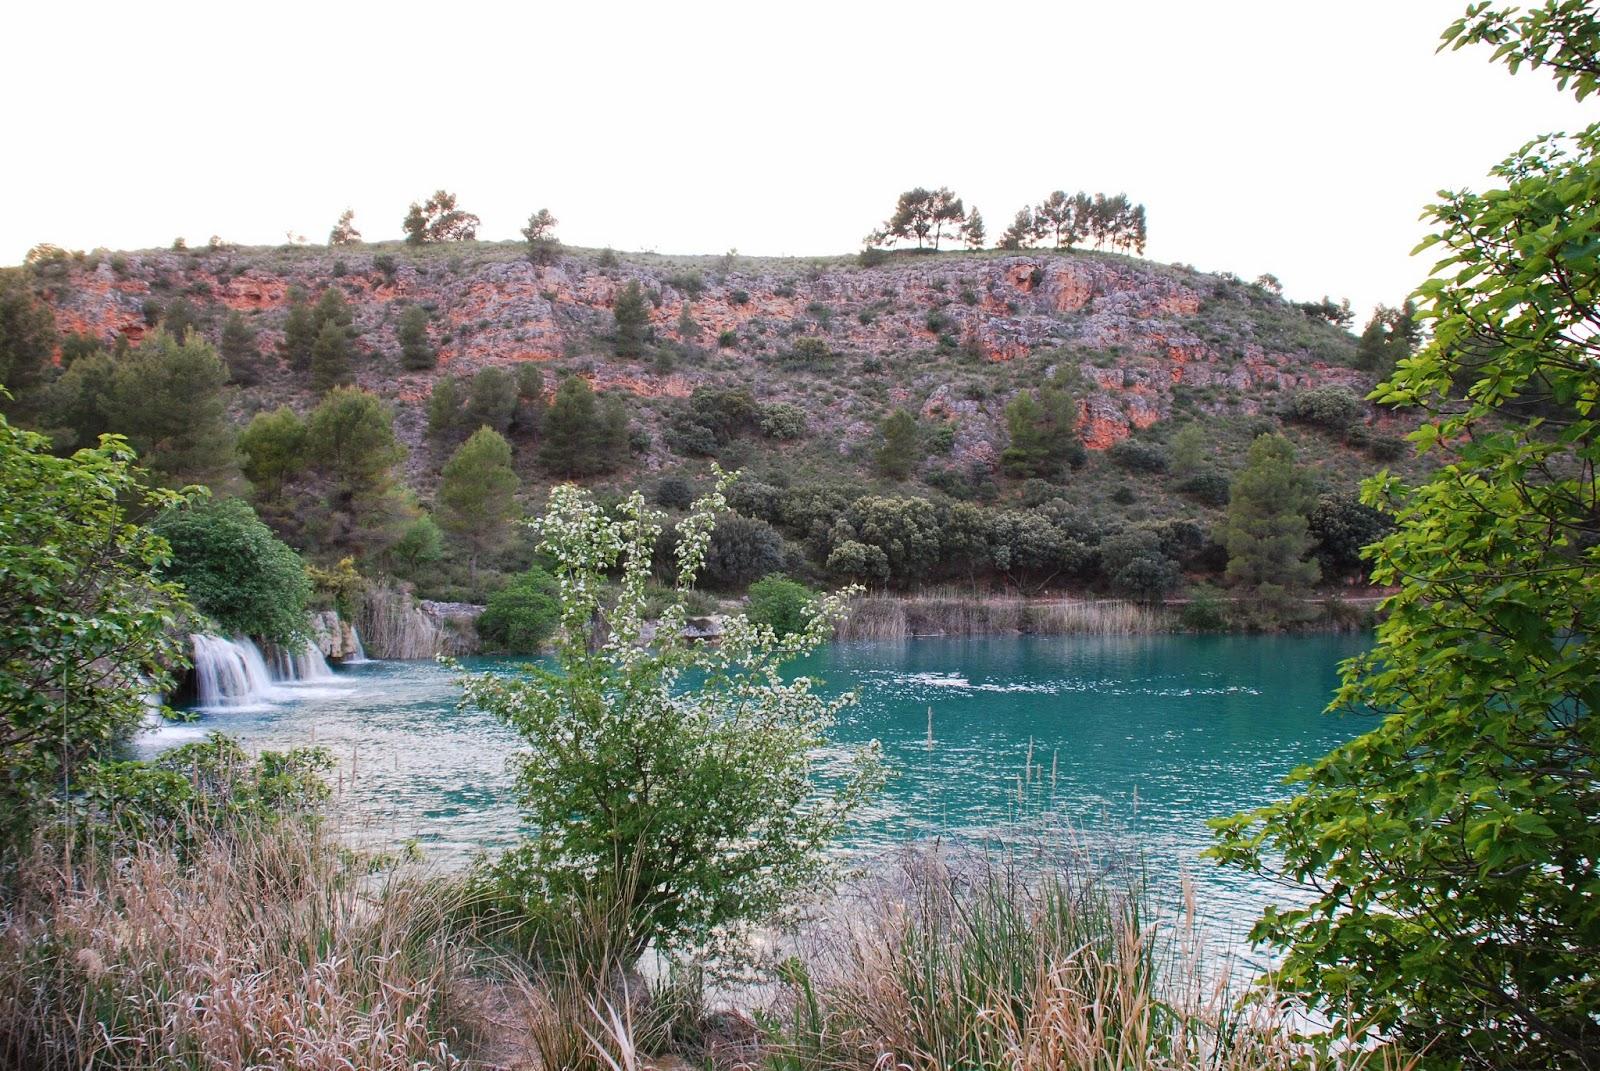 Laguna Batana, Lagunas de Ruidera